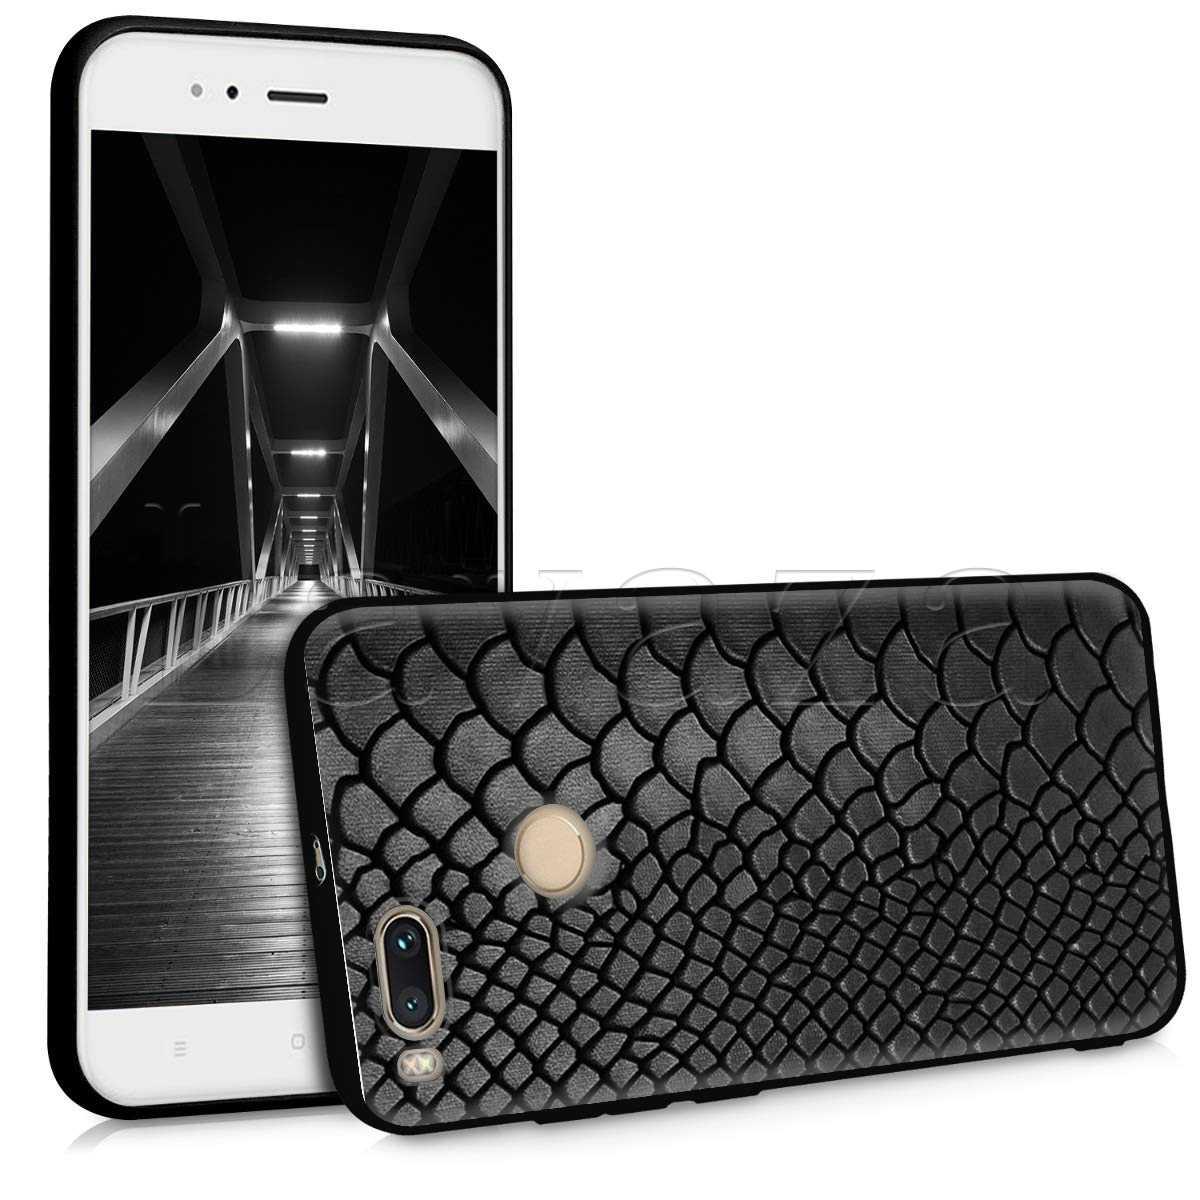 Lavaza Da Rắn Ốp Lưng Silicon Xiaomi Redmi Note 4 4X 4A 5 5A 6 6A 7 8 Pro Đi prime Plus